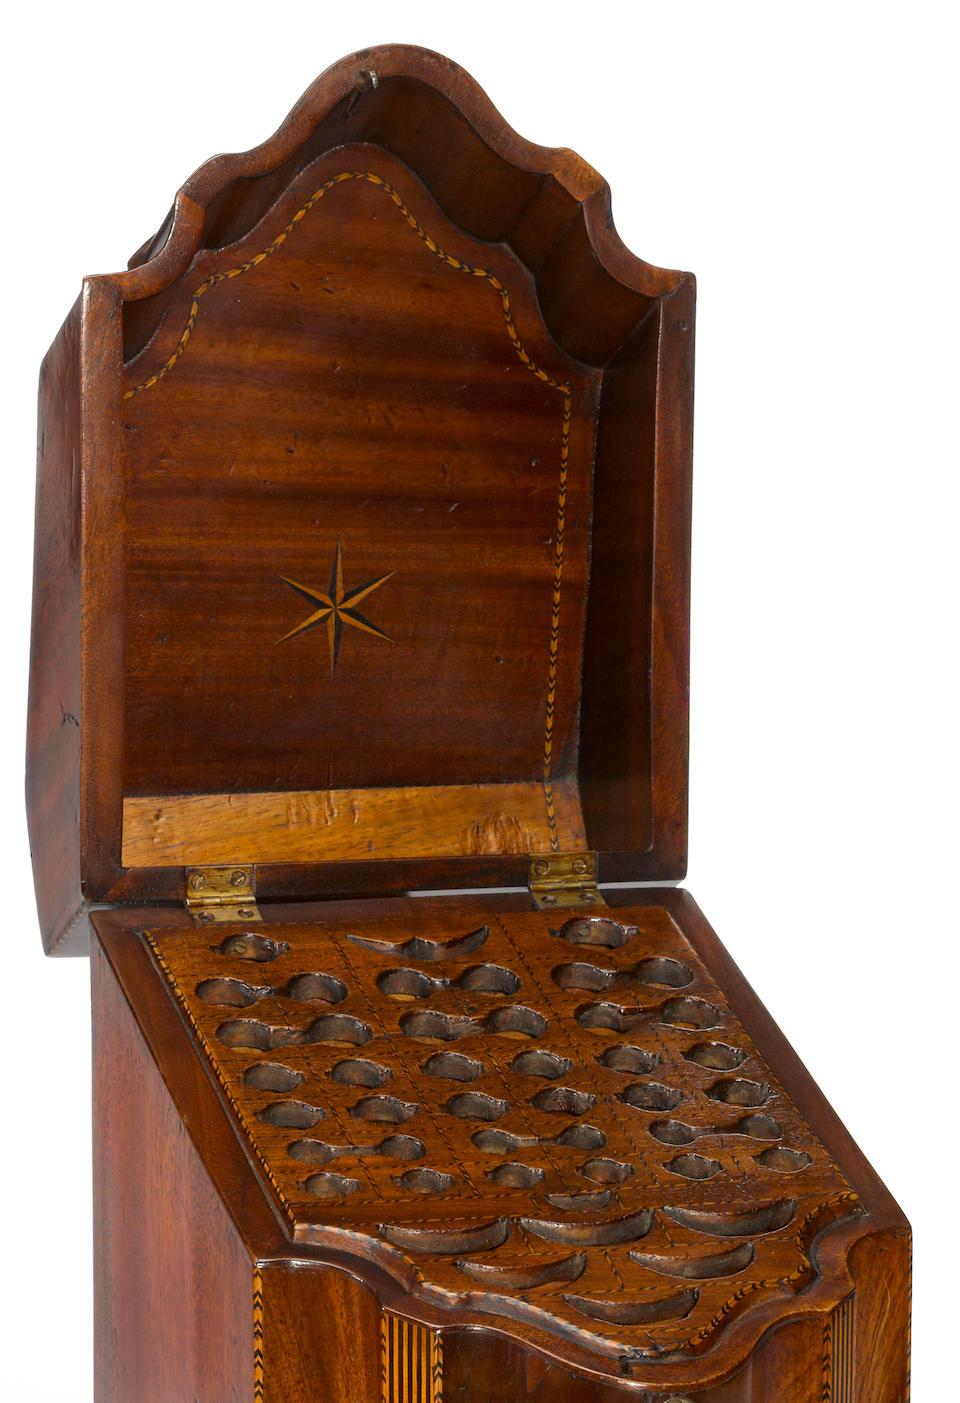 A George III inlaid mahogany knife box fourth quarter 18th century